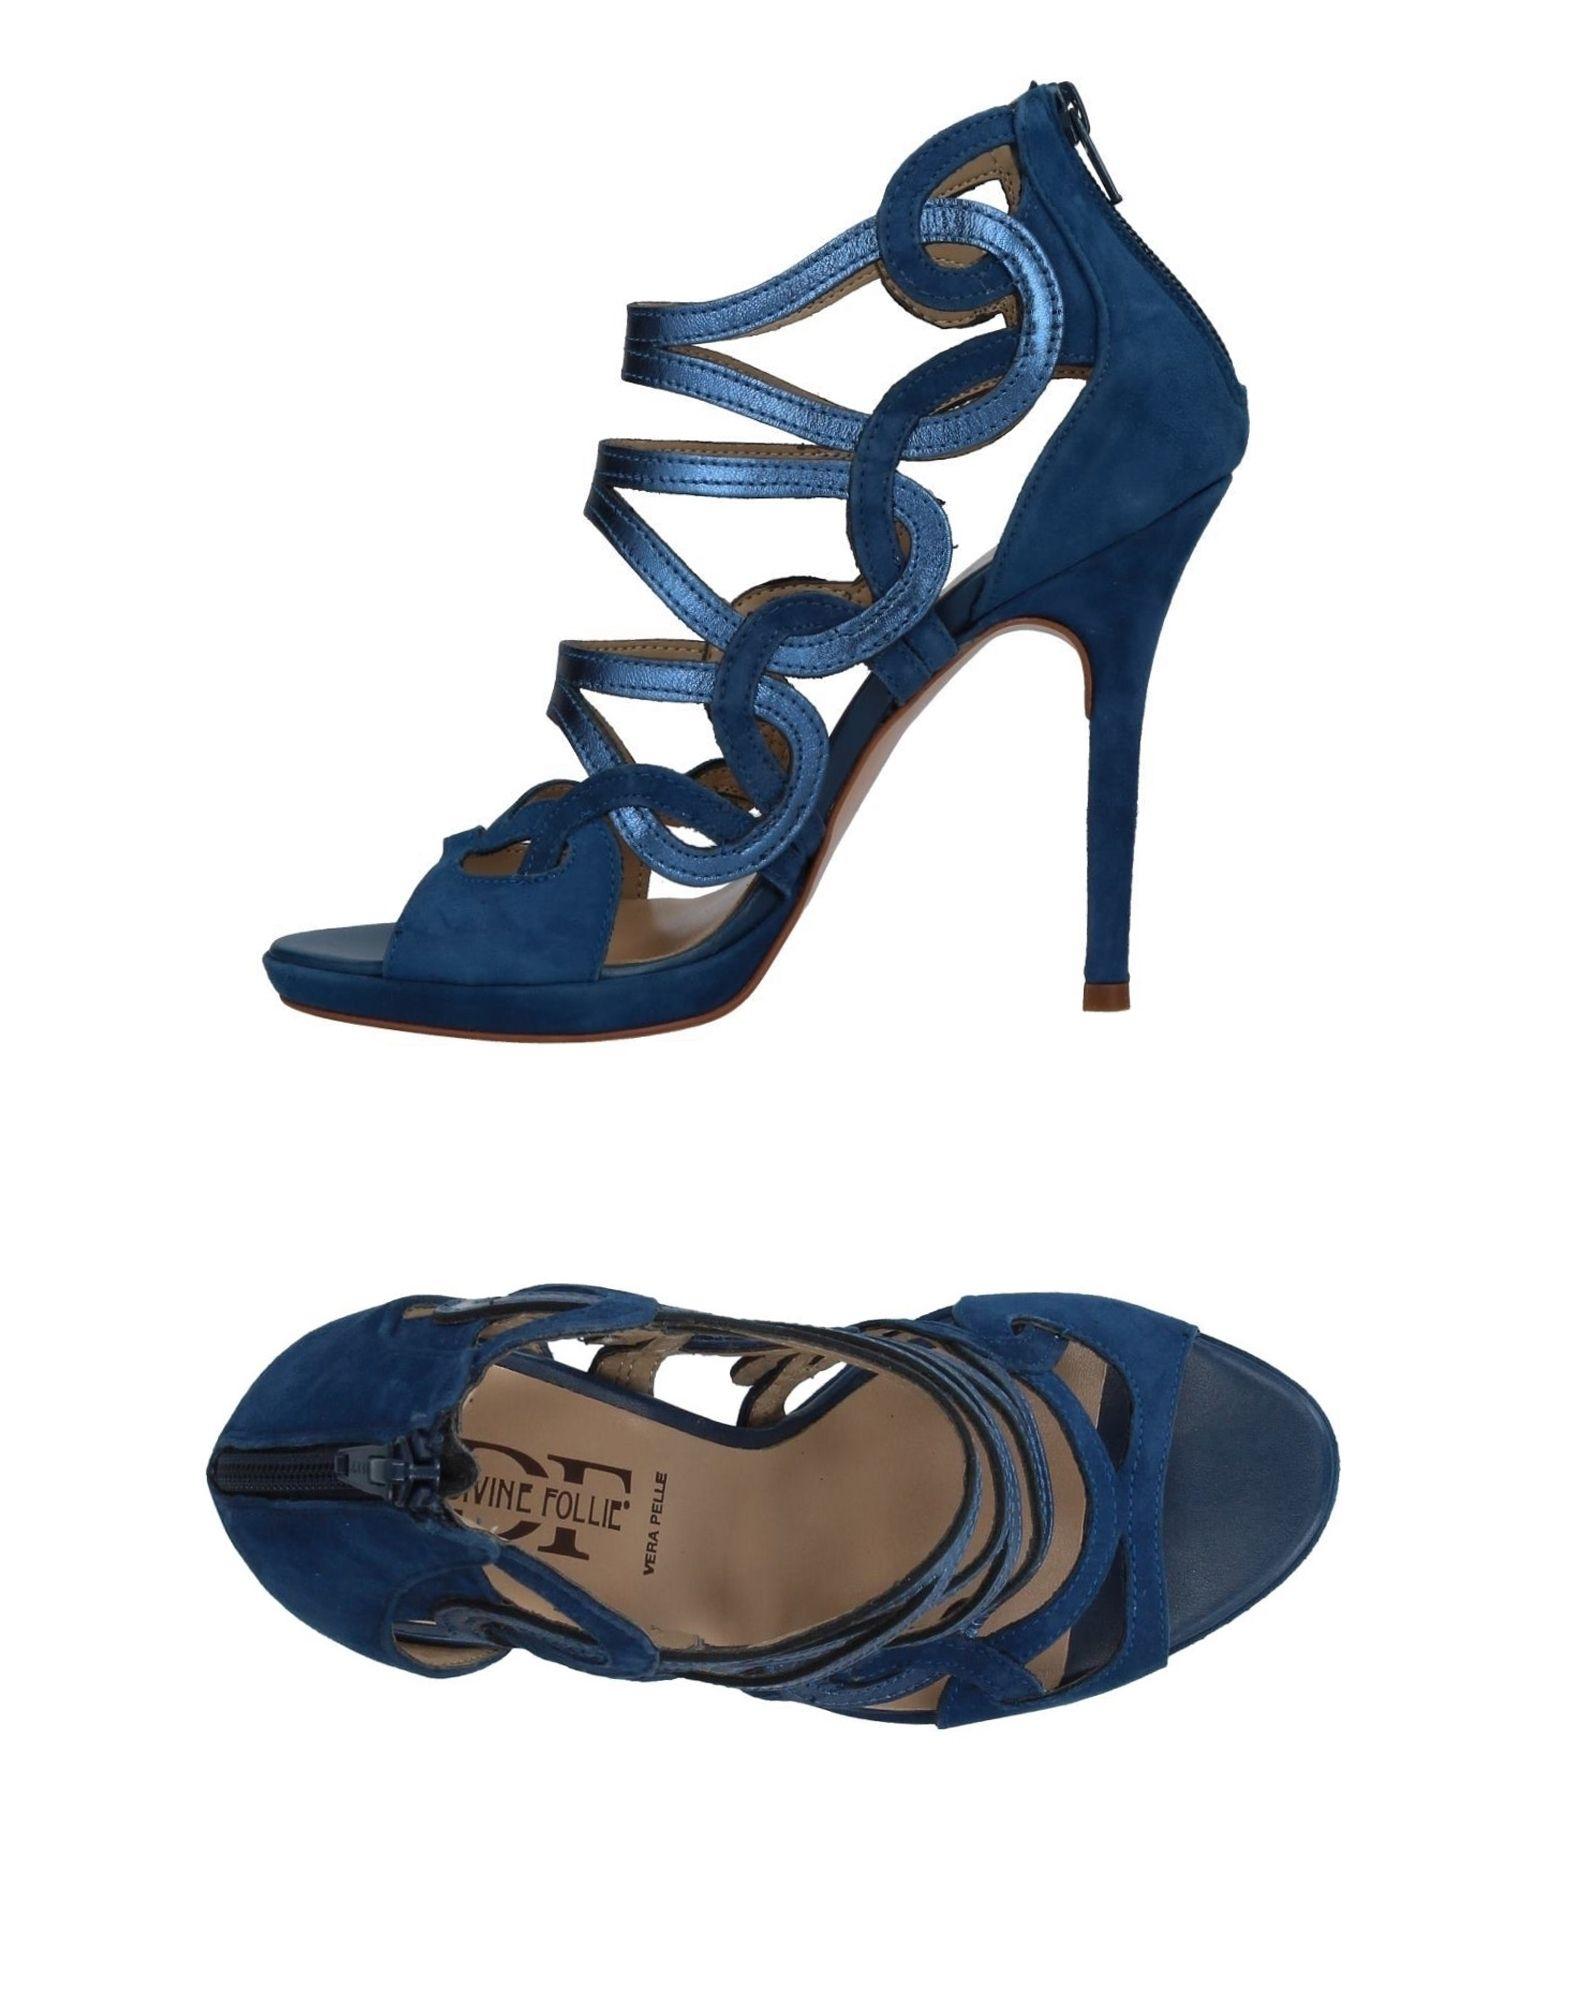 Divine Follie Sandalen Damen  11375761UX Gute Qualität beliebte Schuhe